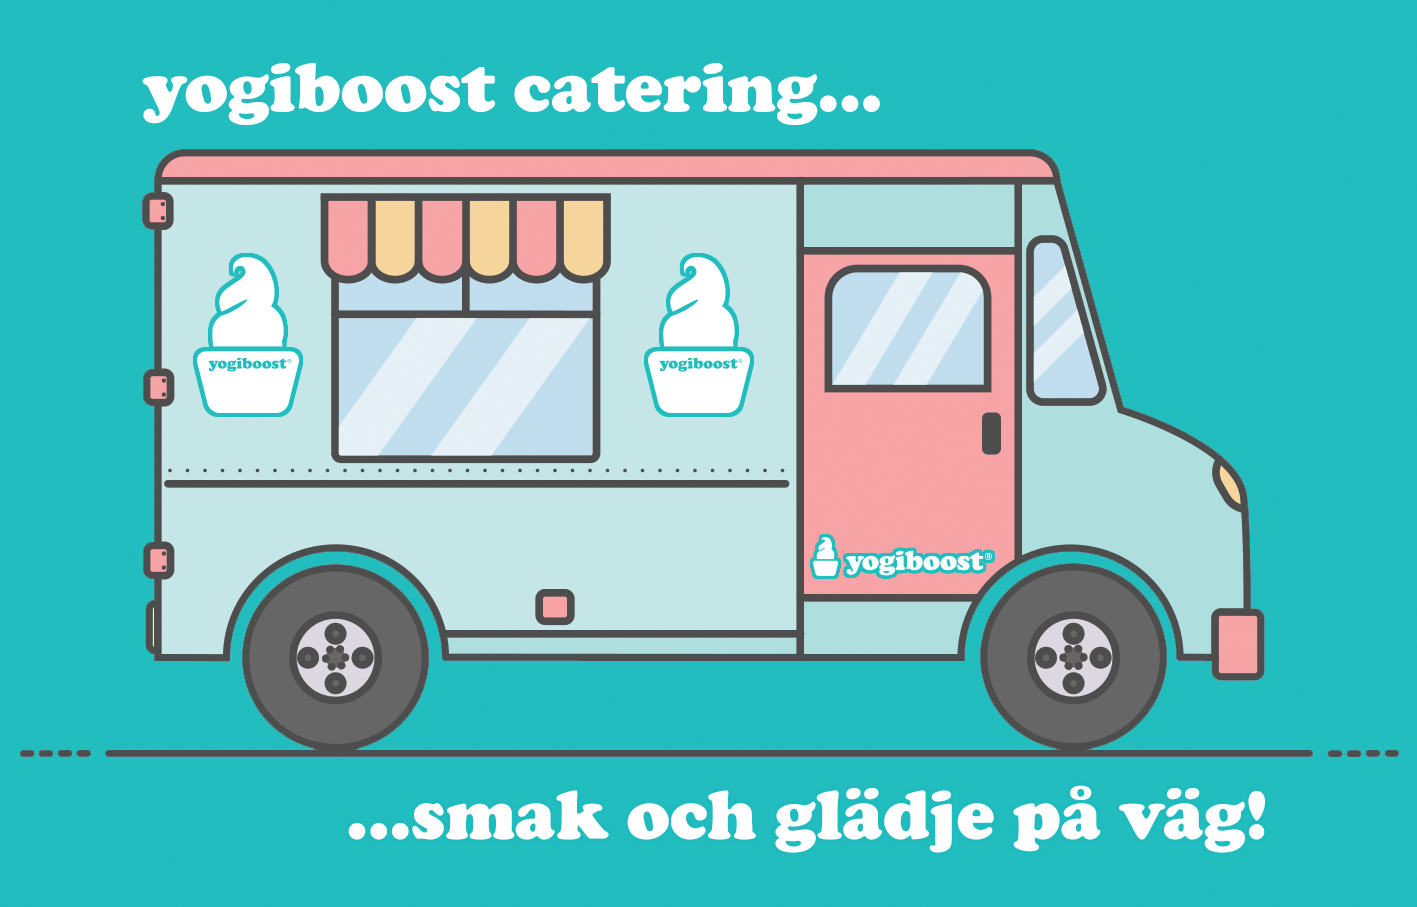 Yogiboost